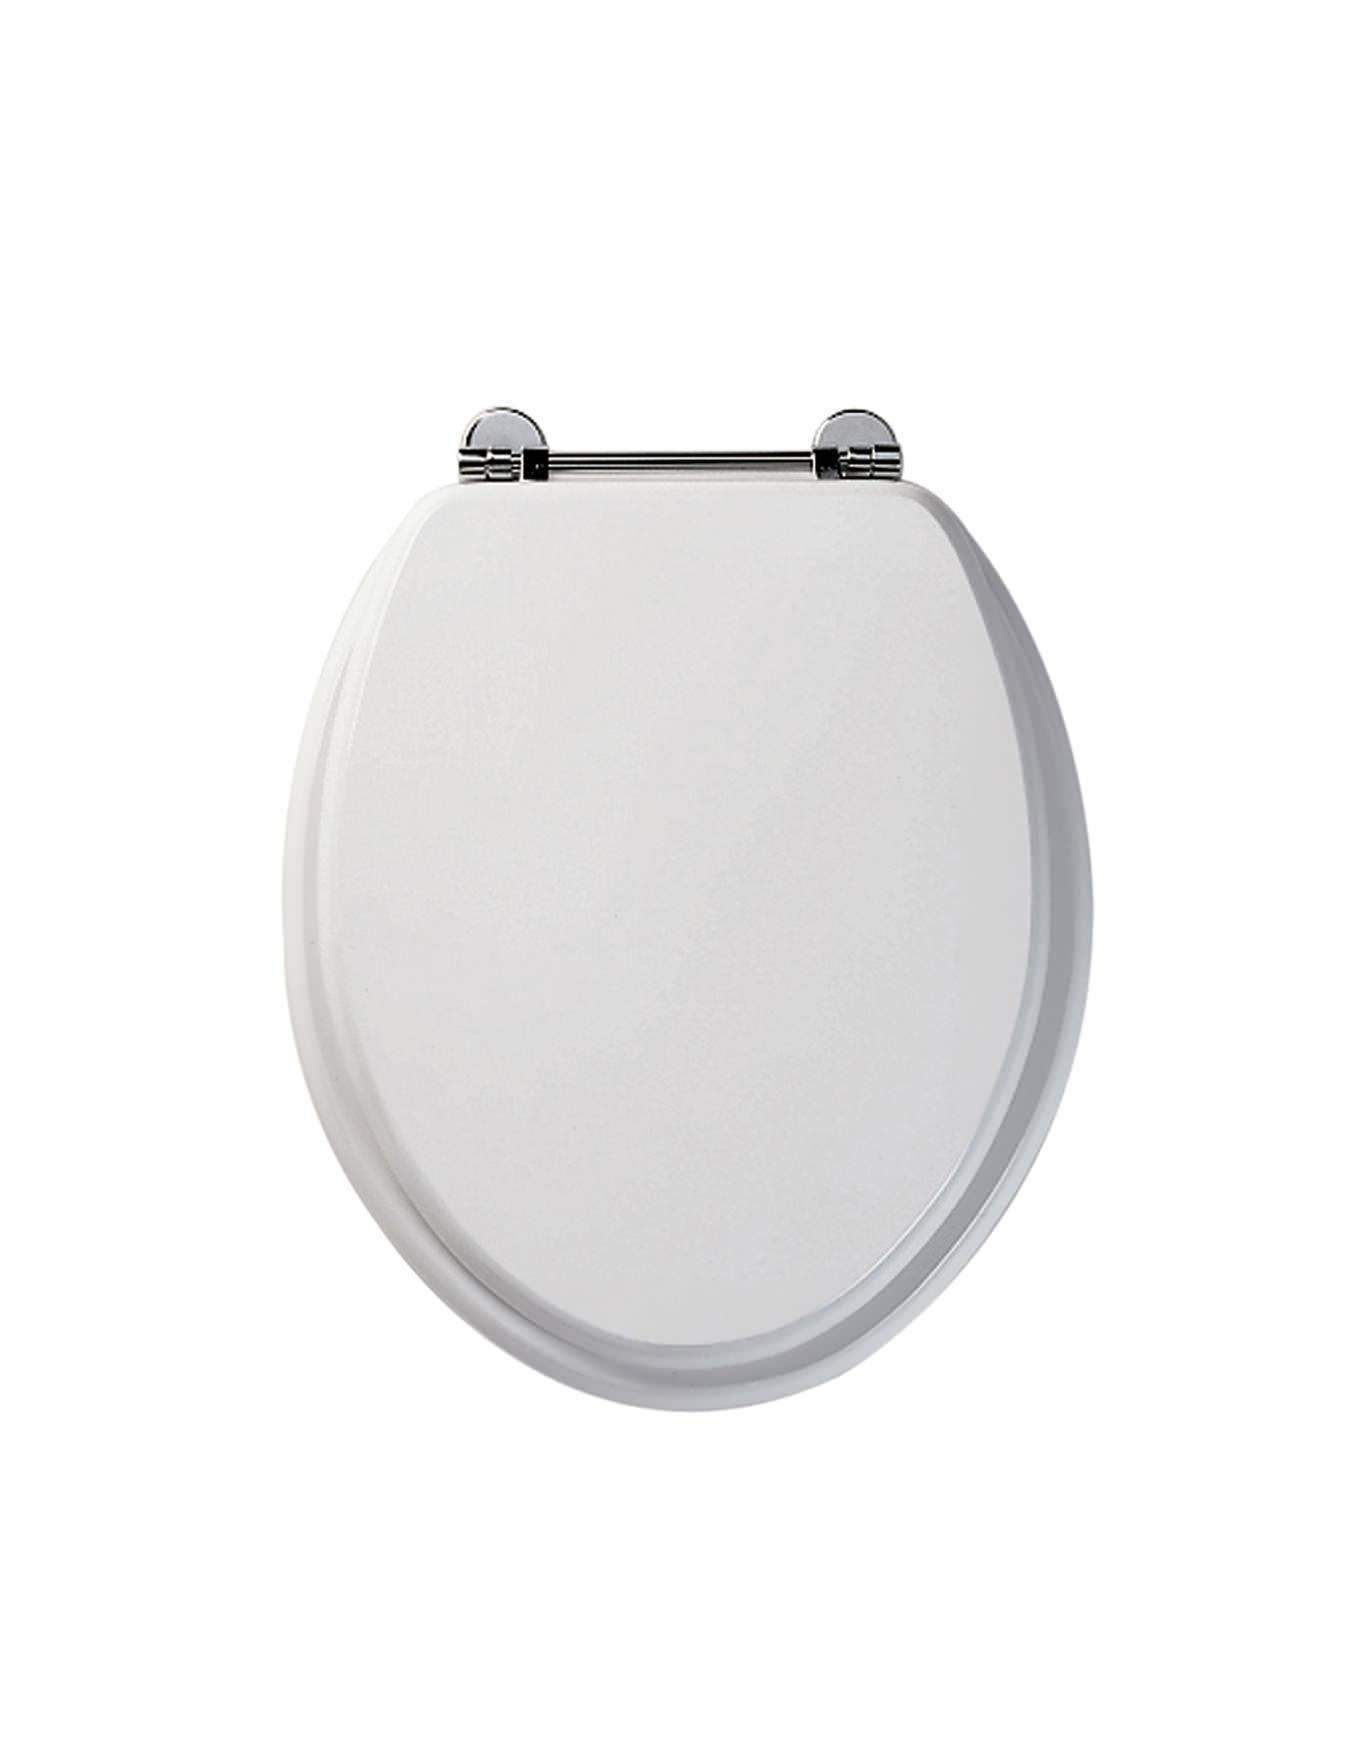 wooden white toilet seat. Roper Rhodes Axis Real Wood Toilet Seat White Finish  8065WH